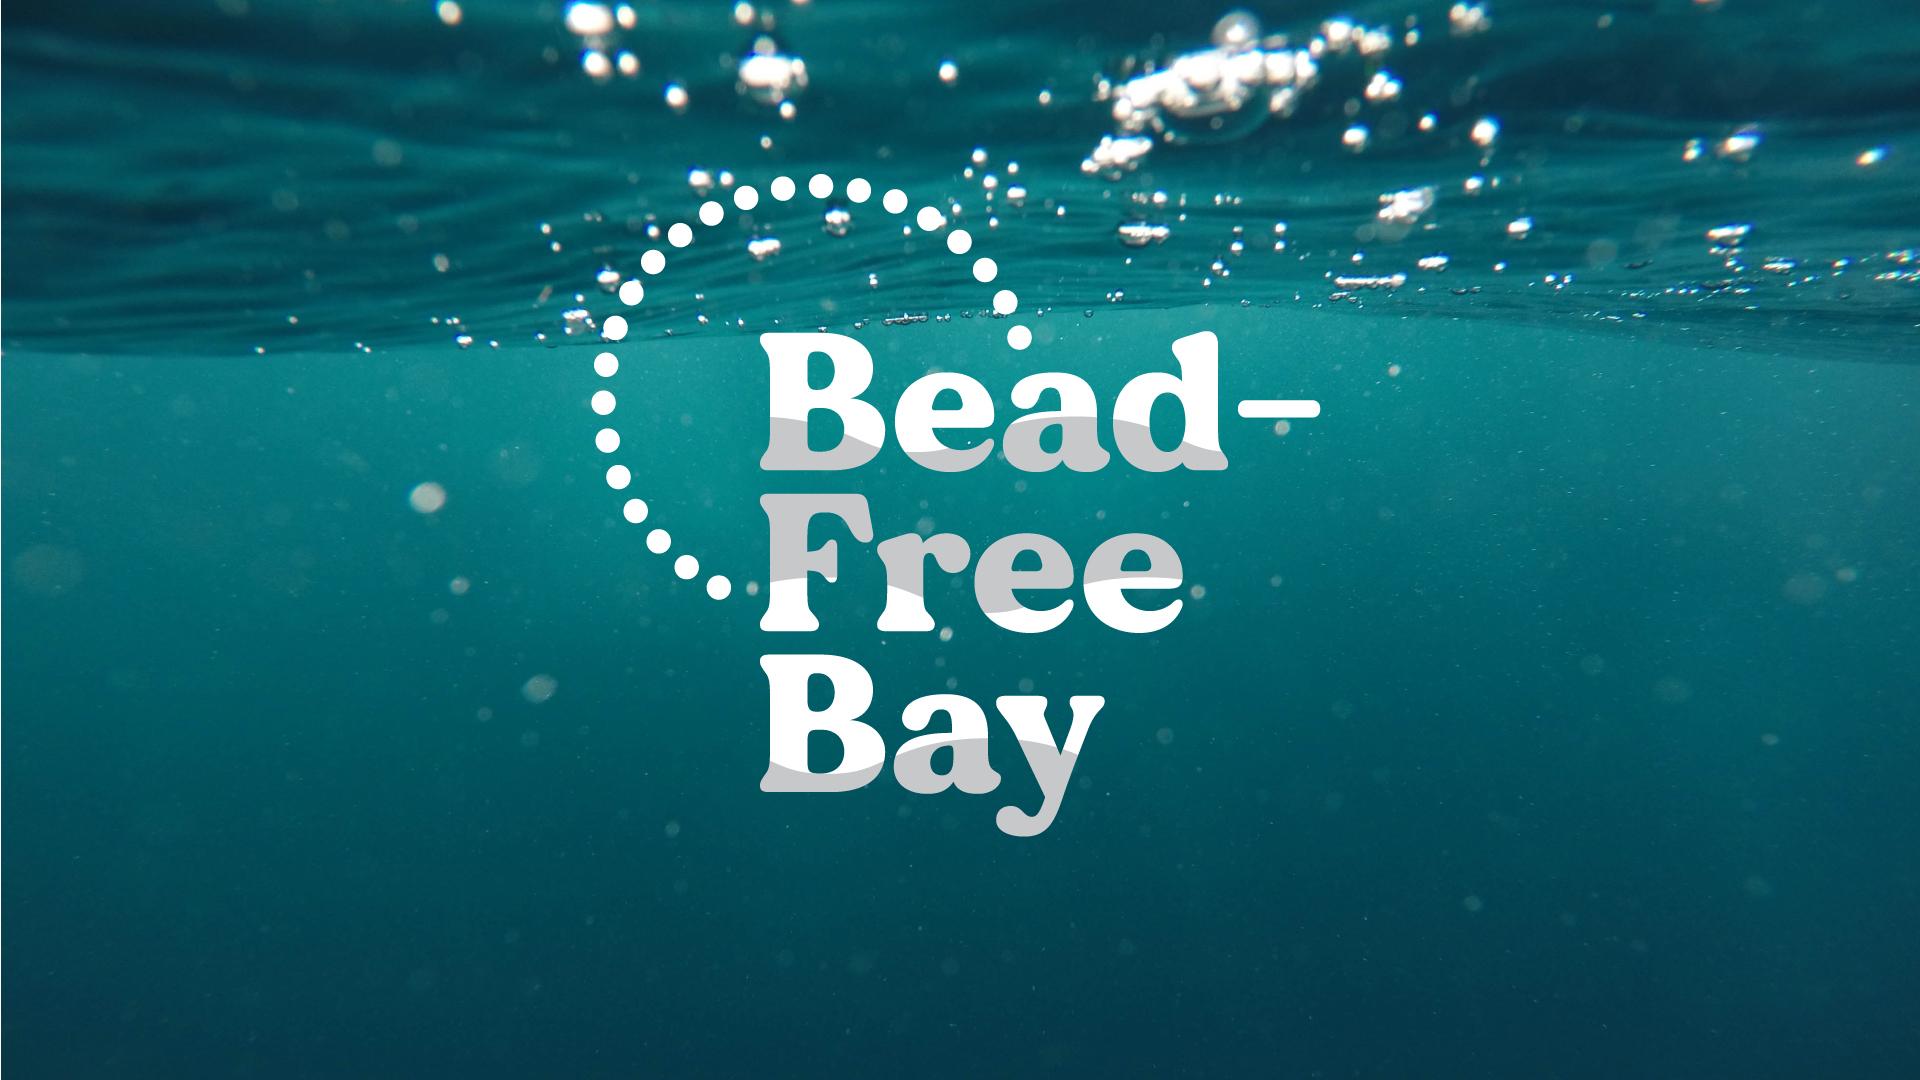 Bead Free Bay logo for Gasparilla in Tampa, FL